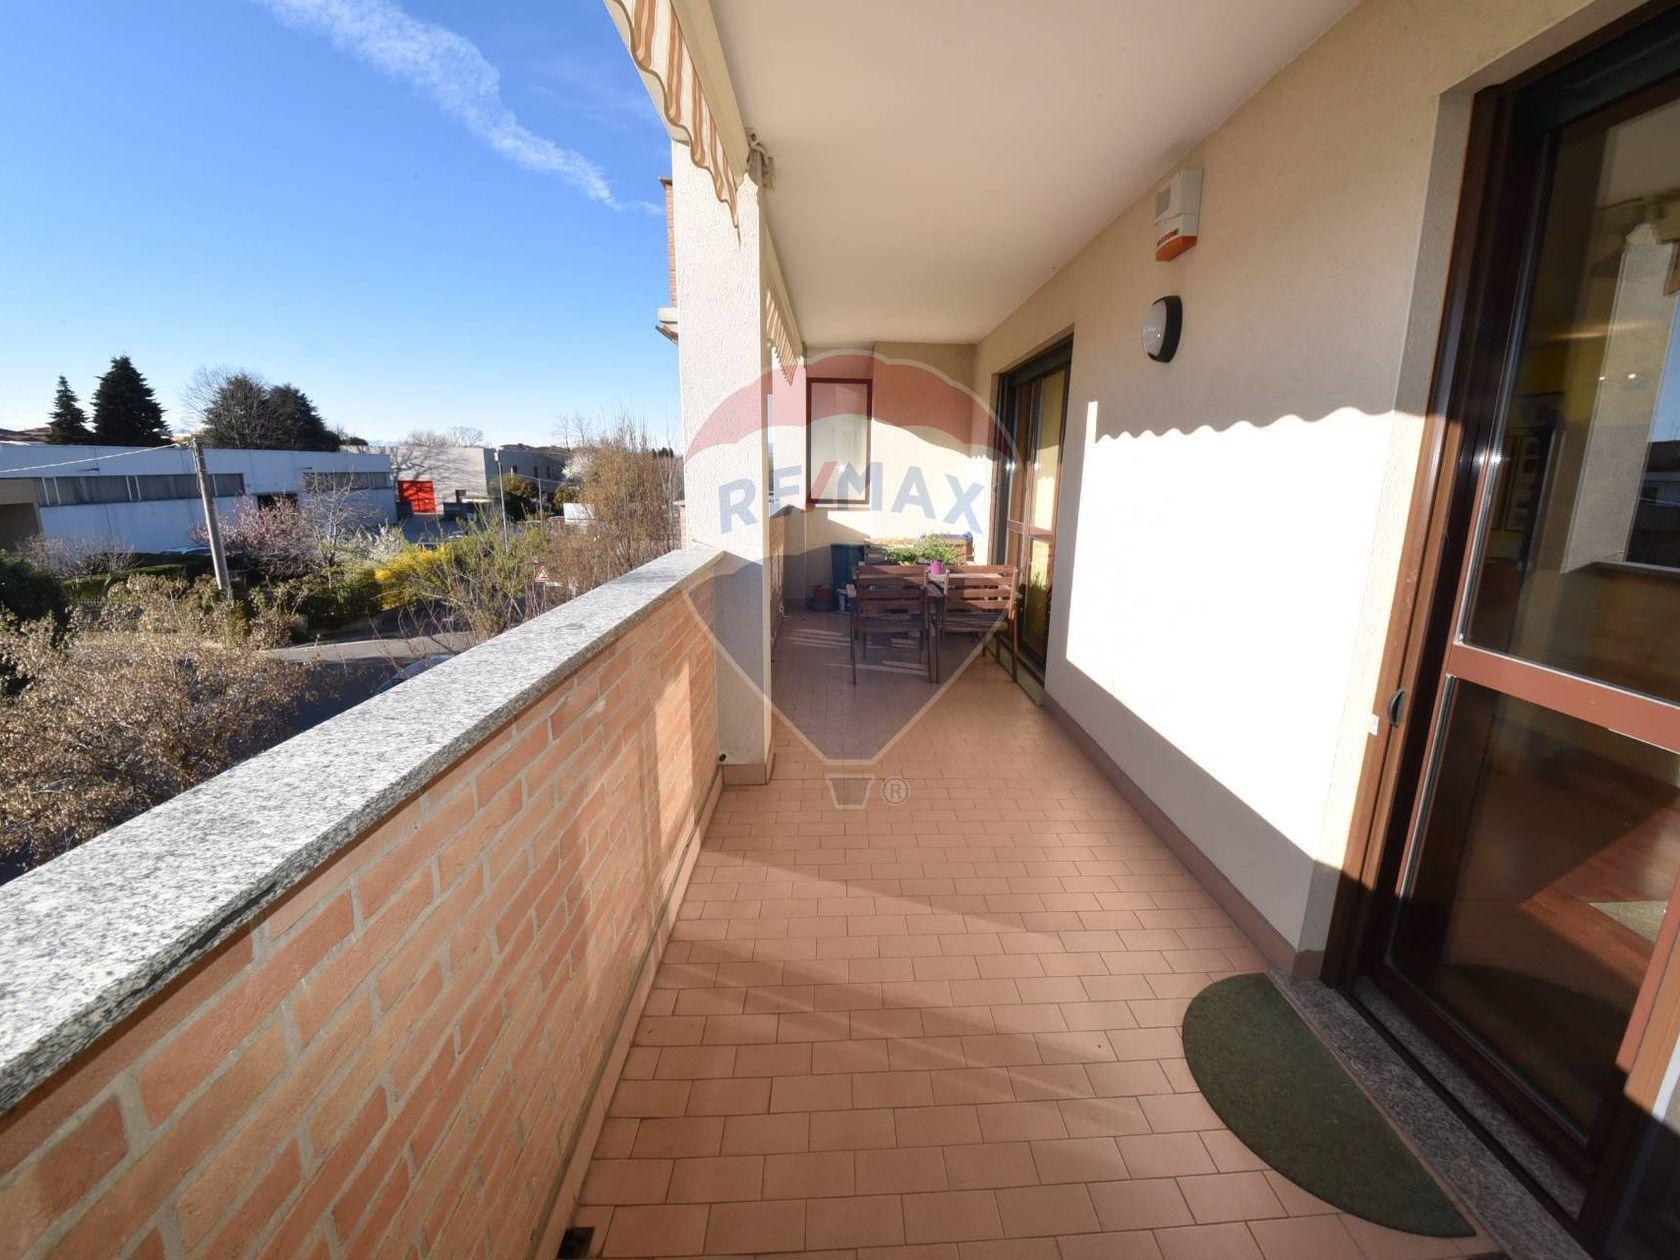 Appartamento Cascina ferrara, Saronno, VA Vendita - Foto 6